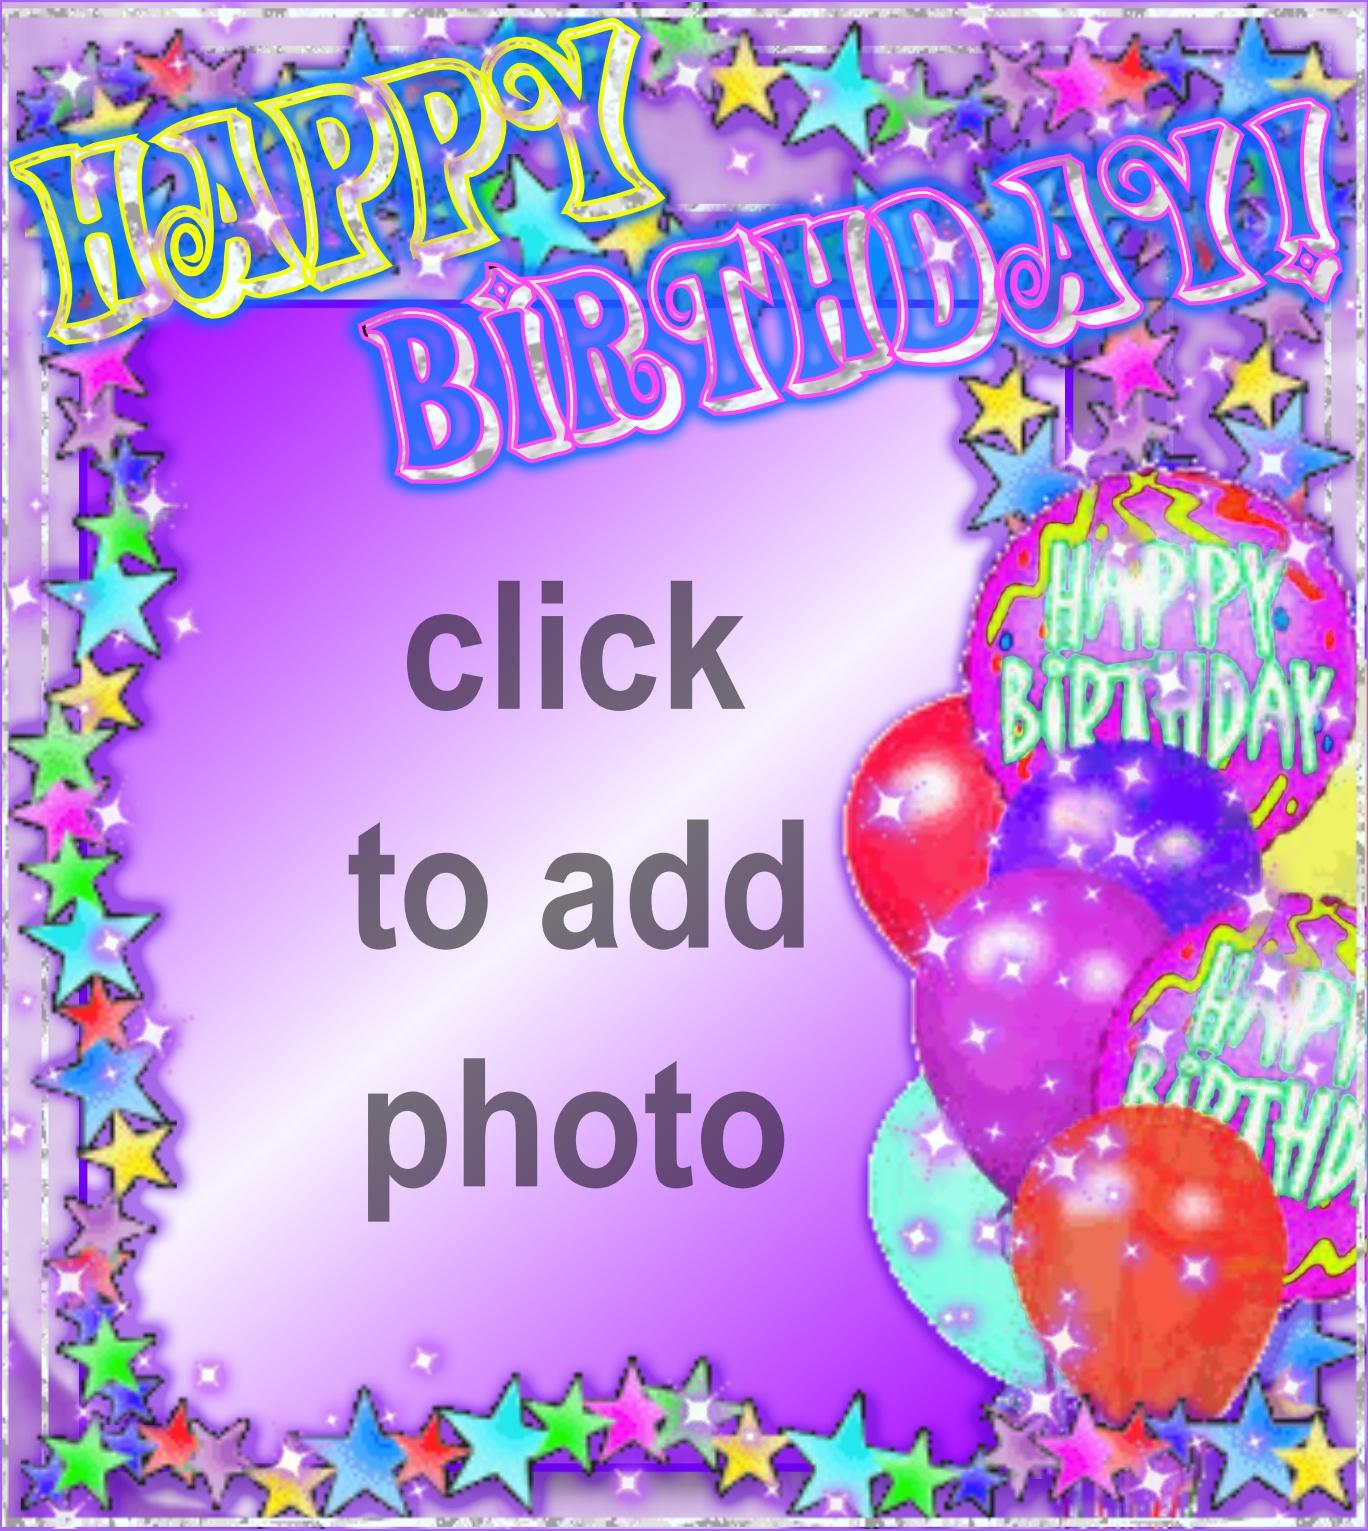 Imikimi Birthday Card With Photo Insert Thedoctsite